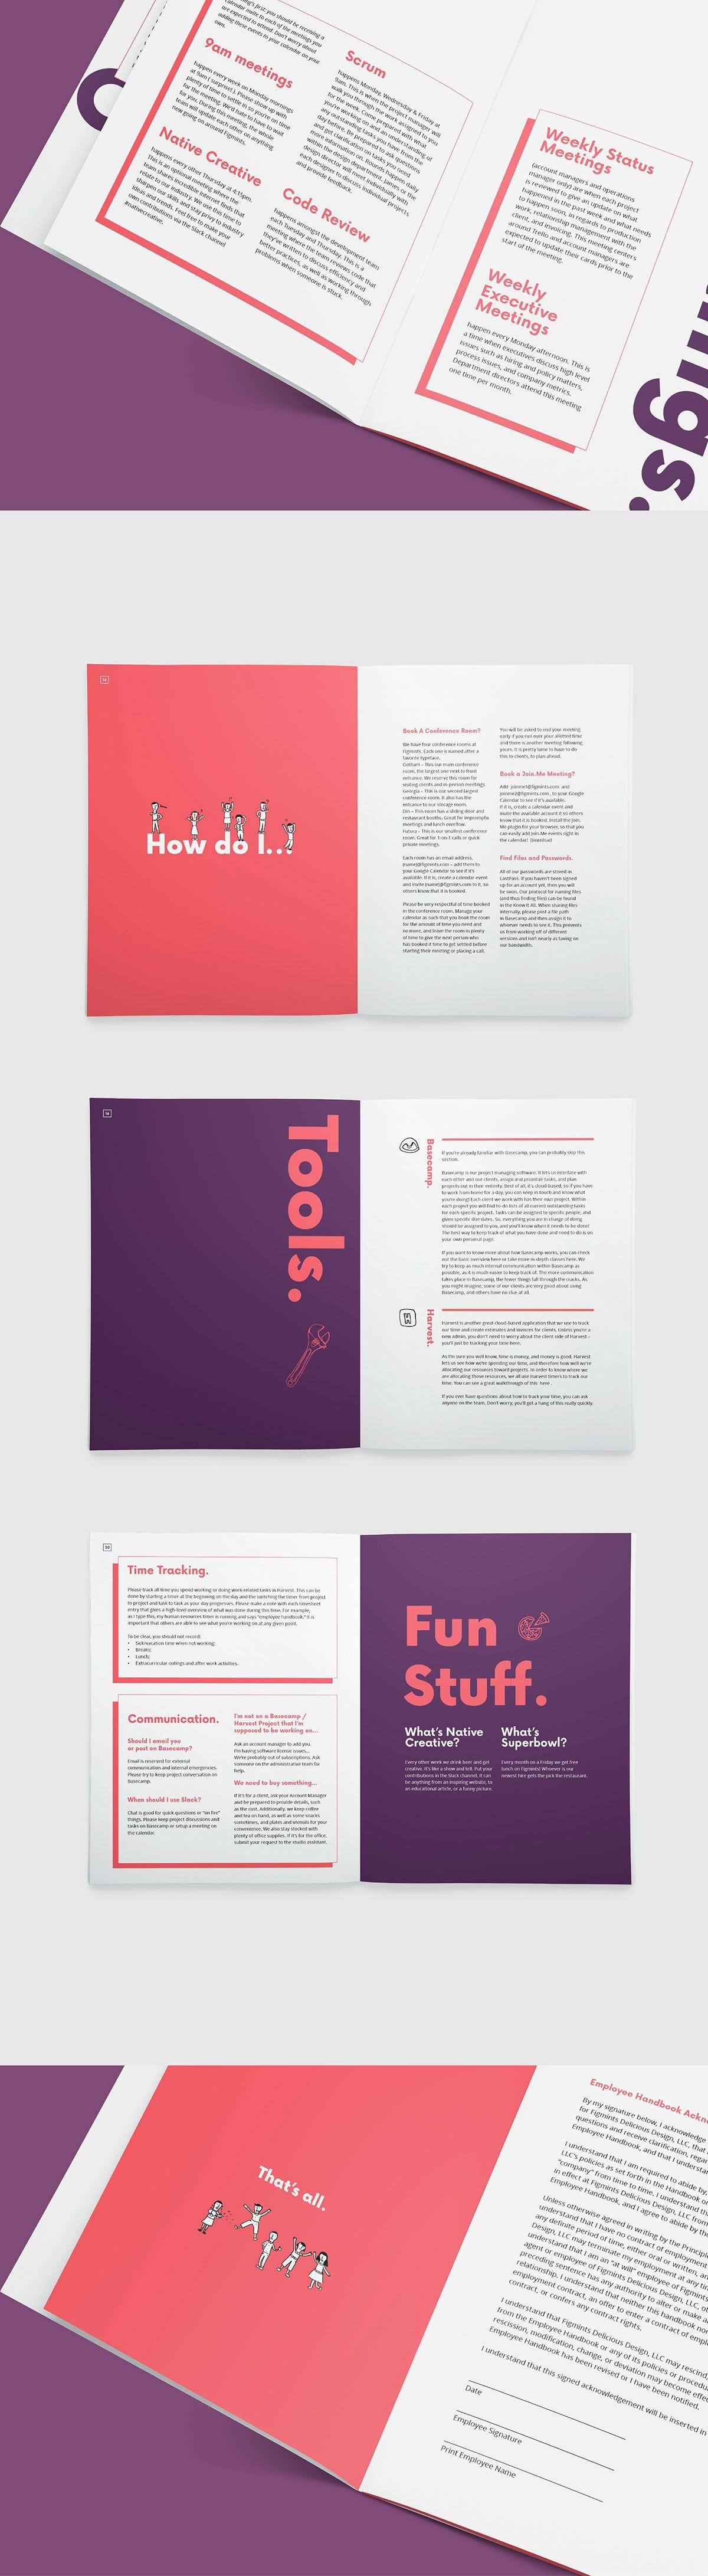 Figmints Employee Handbook On Risd Portfolios Employee Handbook